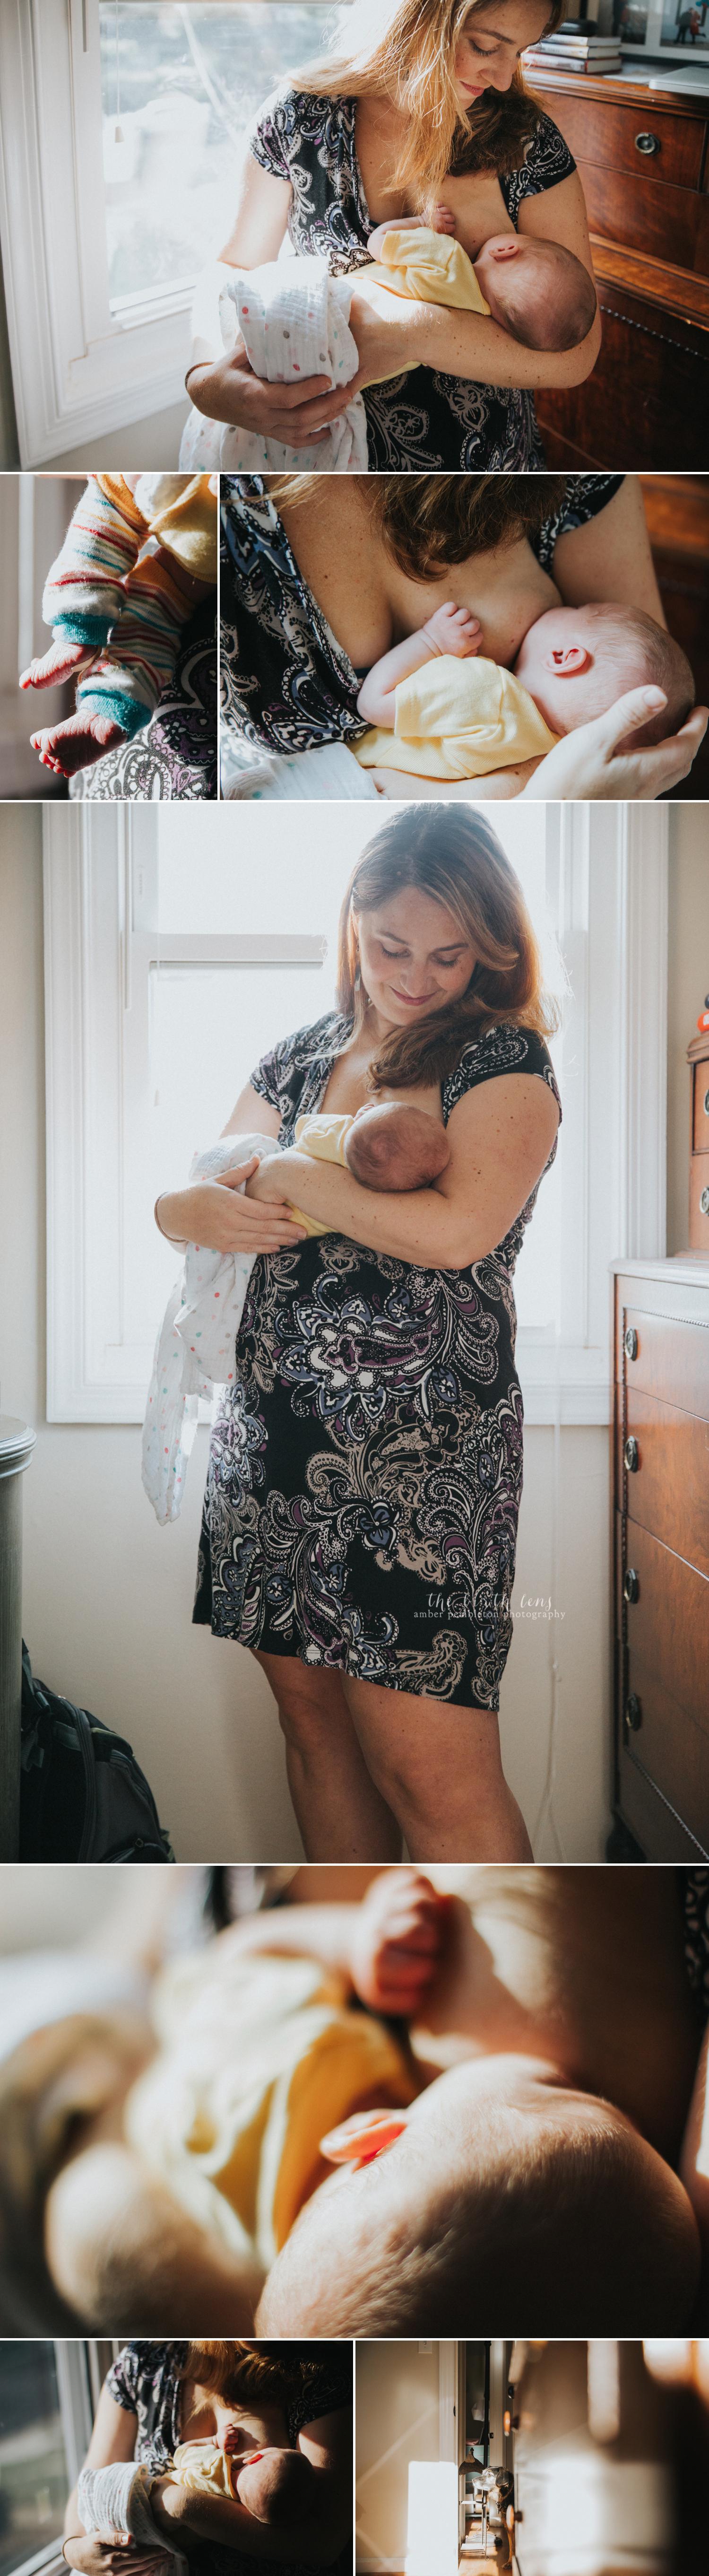 mom-holding-baby-in-window-light-sparks-nv.jpg